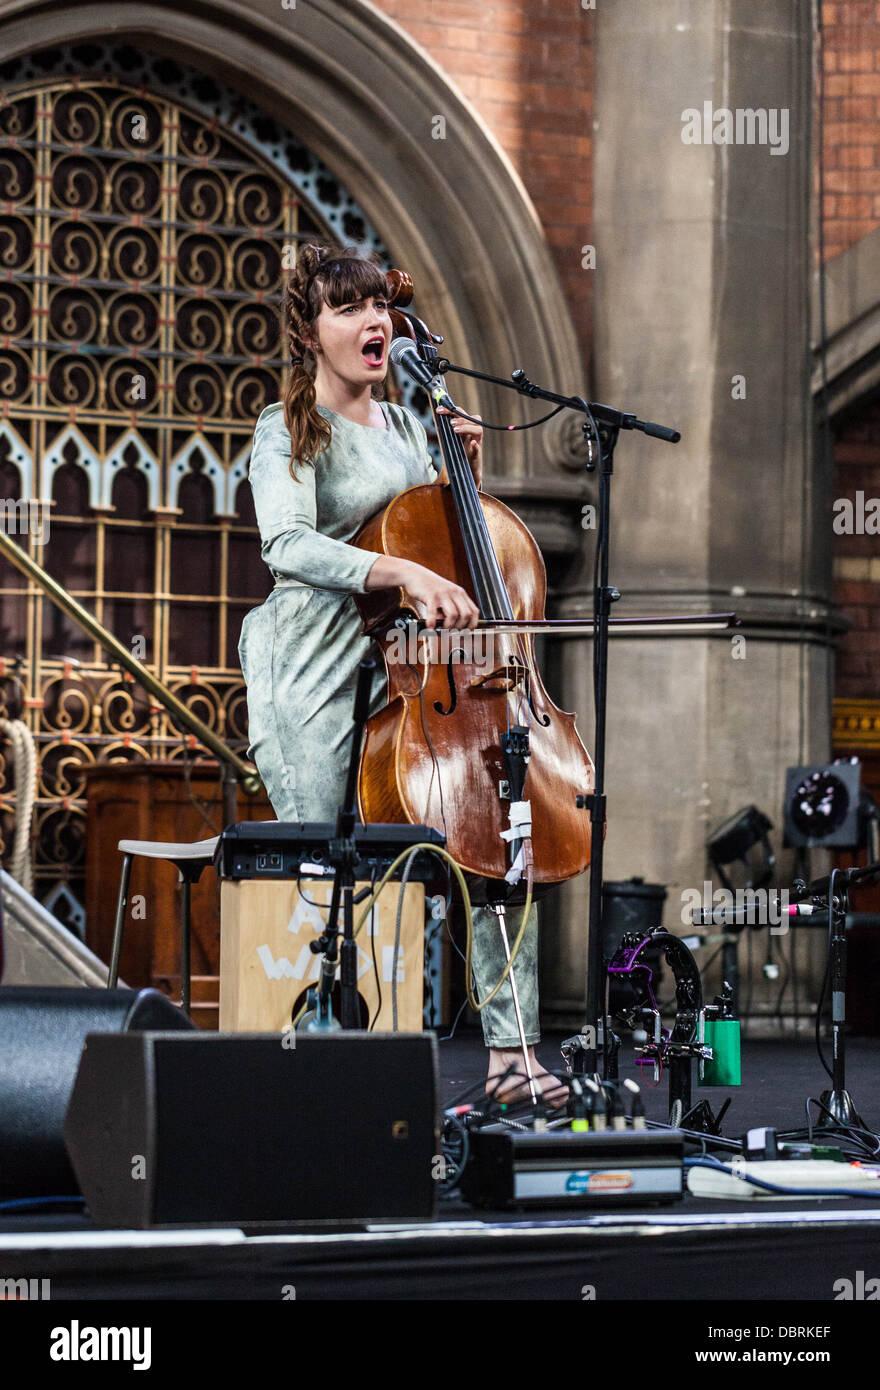 Abi Wade performing at the Daylight Music, Union Chapel, London, England, UK - Stock Image